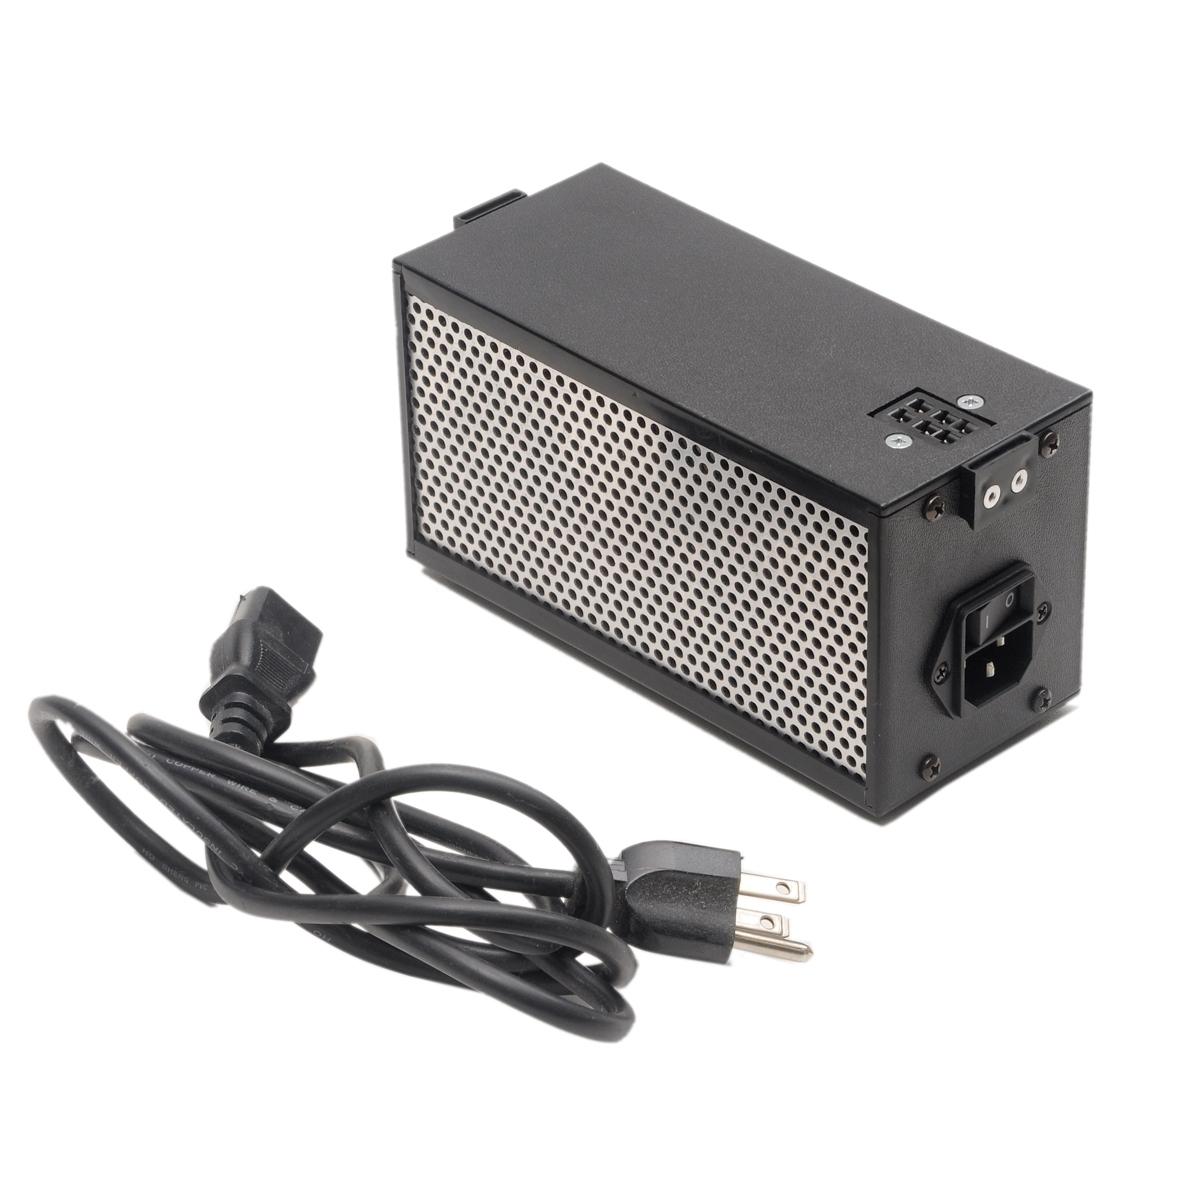 Lumedyne Ac Power Boosters Speed Modules Supply 30 Amp International